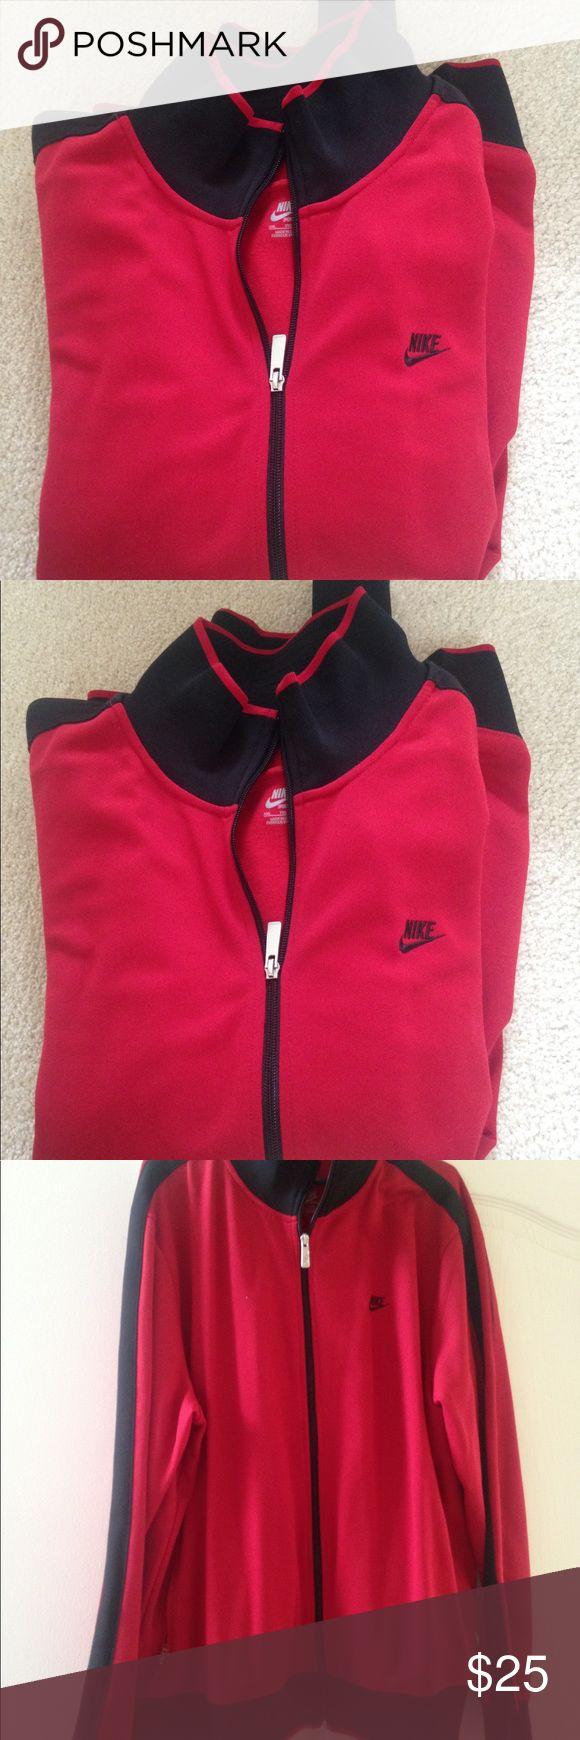 Nike Track Jacket Nike Track Jacket on trend fashion piece..offers are welcome. bundle and save its gift giving season 🎄 Nike Jackets & Coats